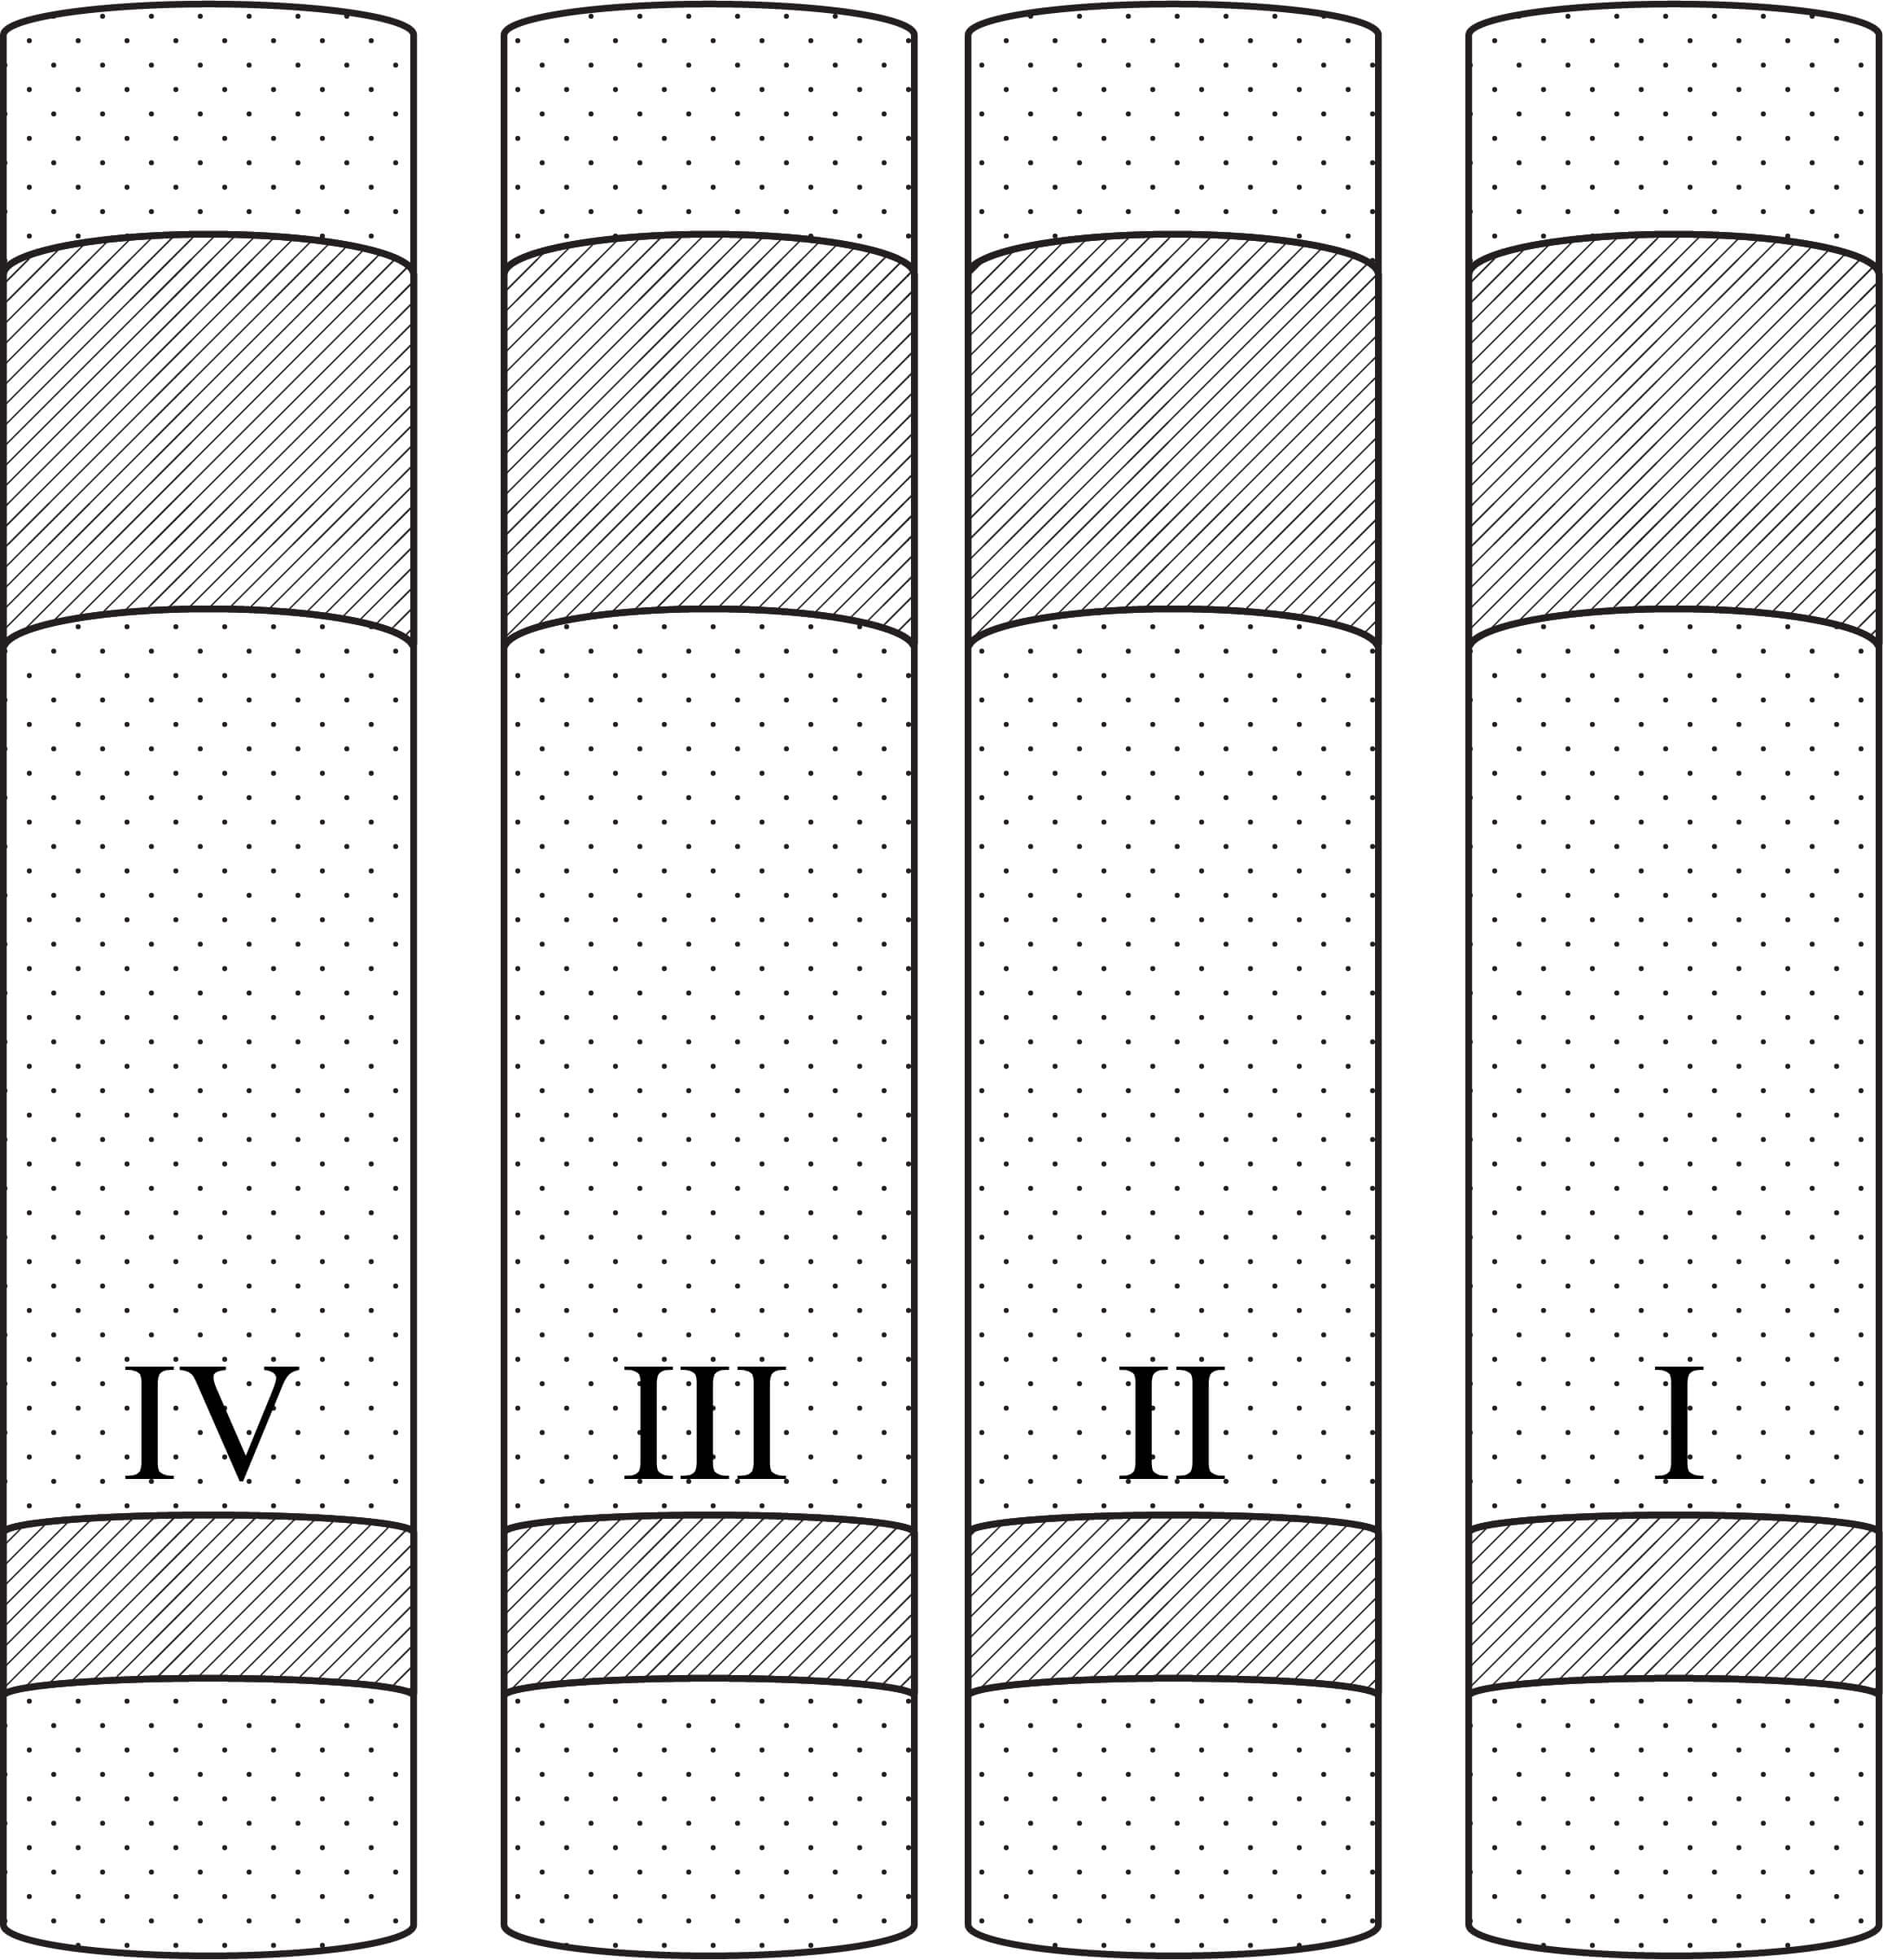 encyclopedia of romania in four volumes